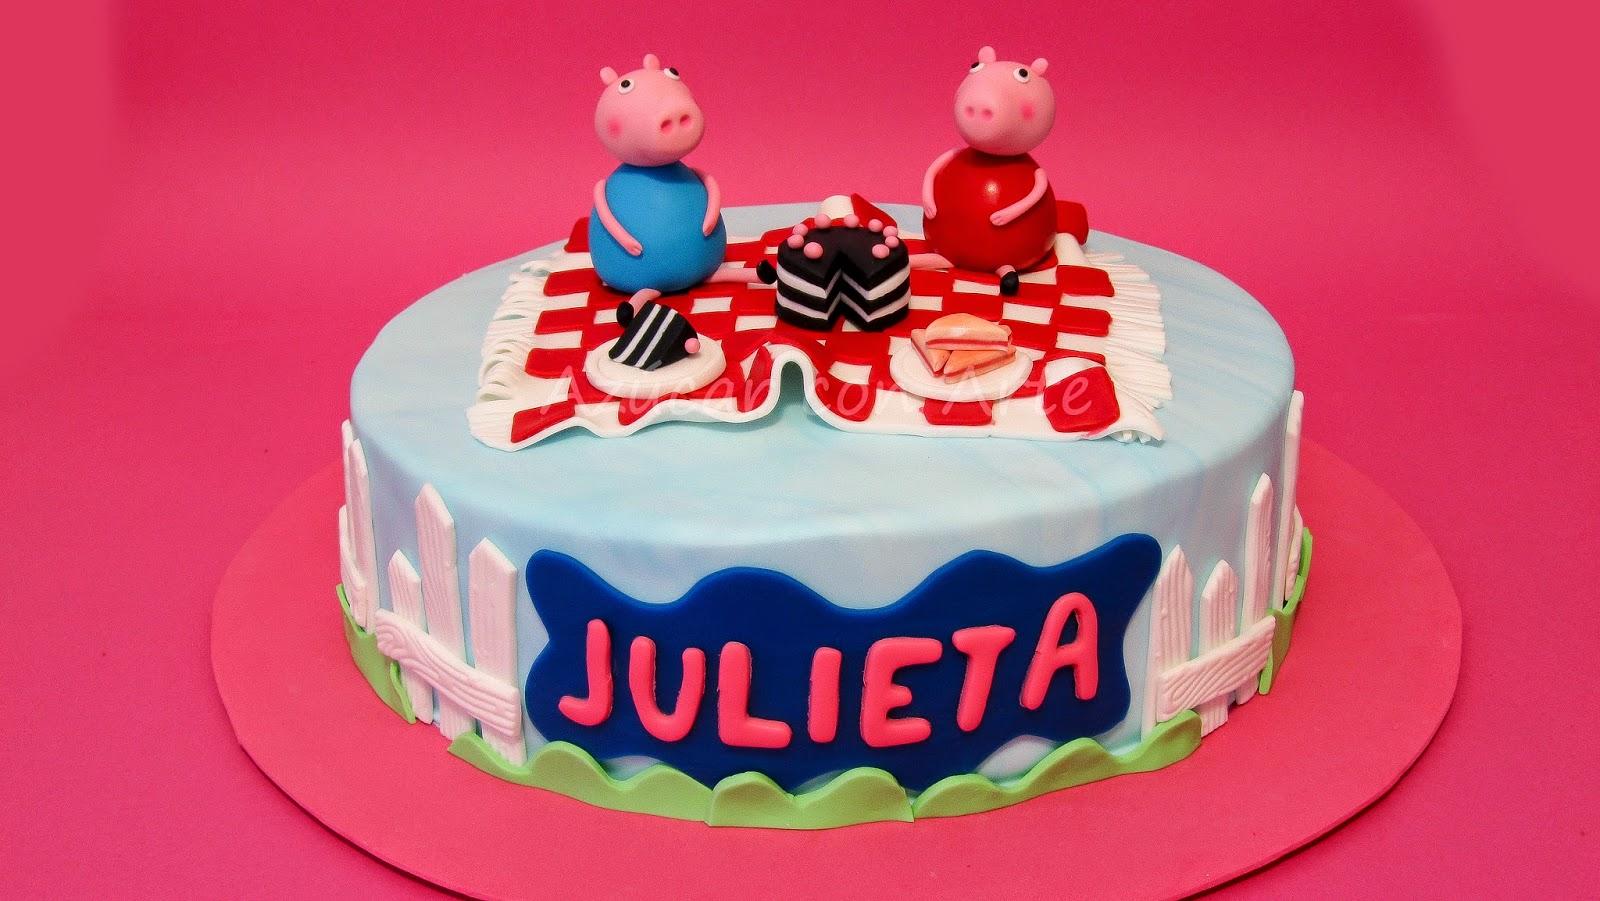 tarta peppa pig, peppa pig cake,tarta sin gluten, gluten free cake|azucar con arte